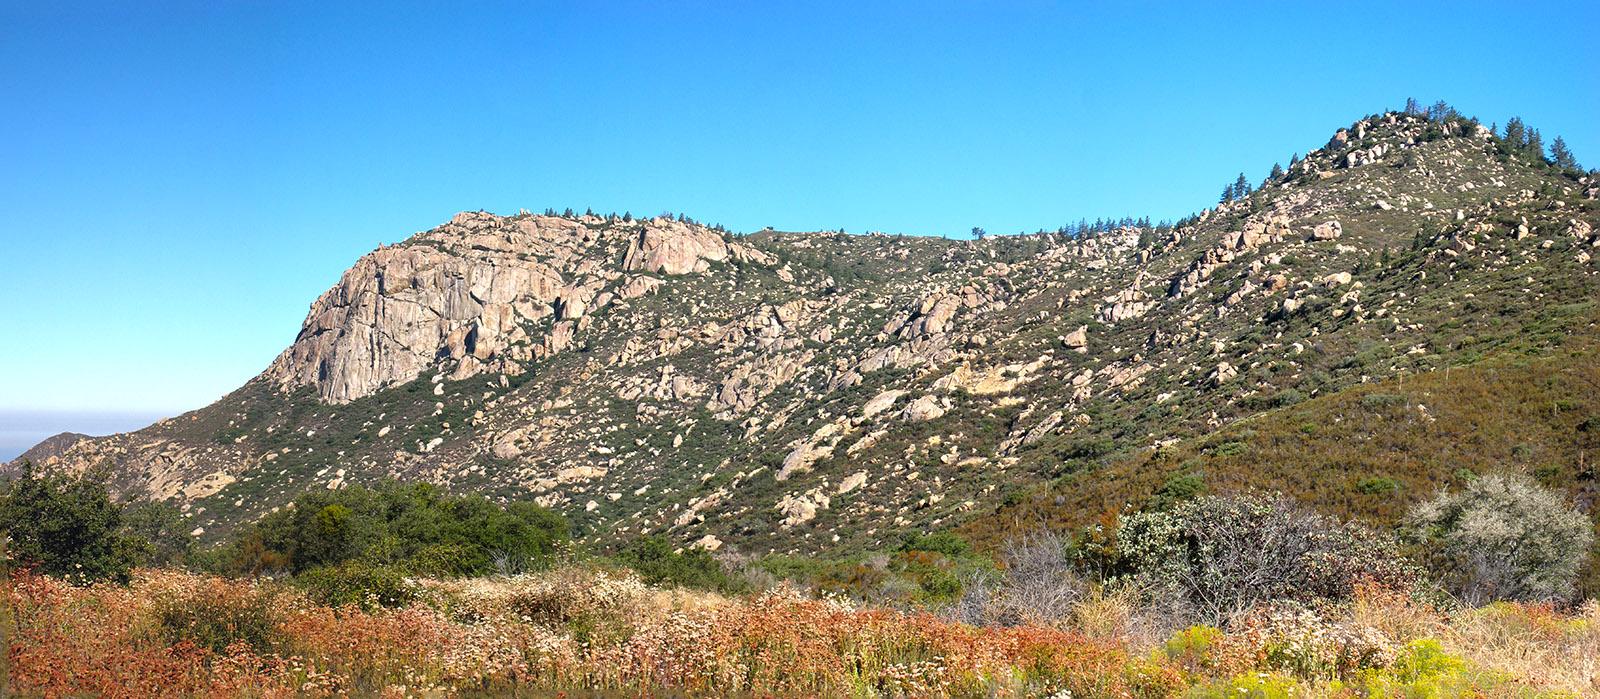 Corte Madera Mountain